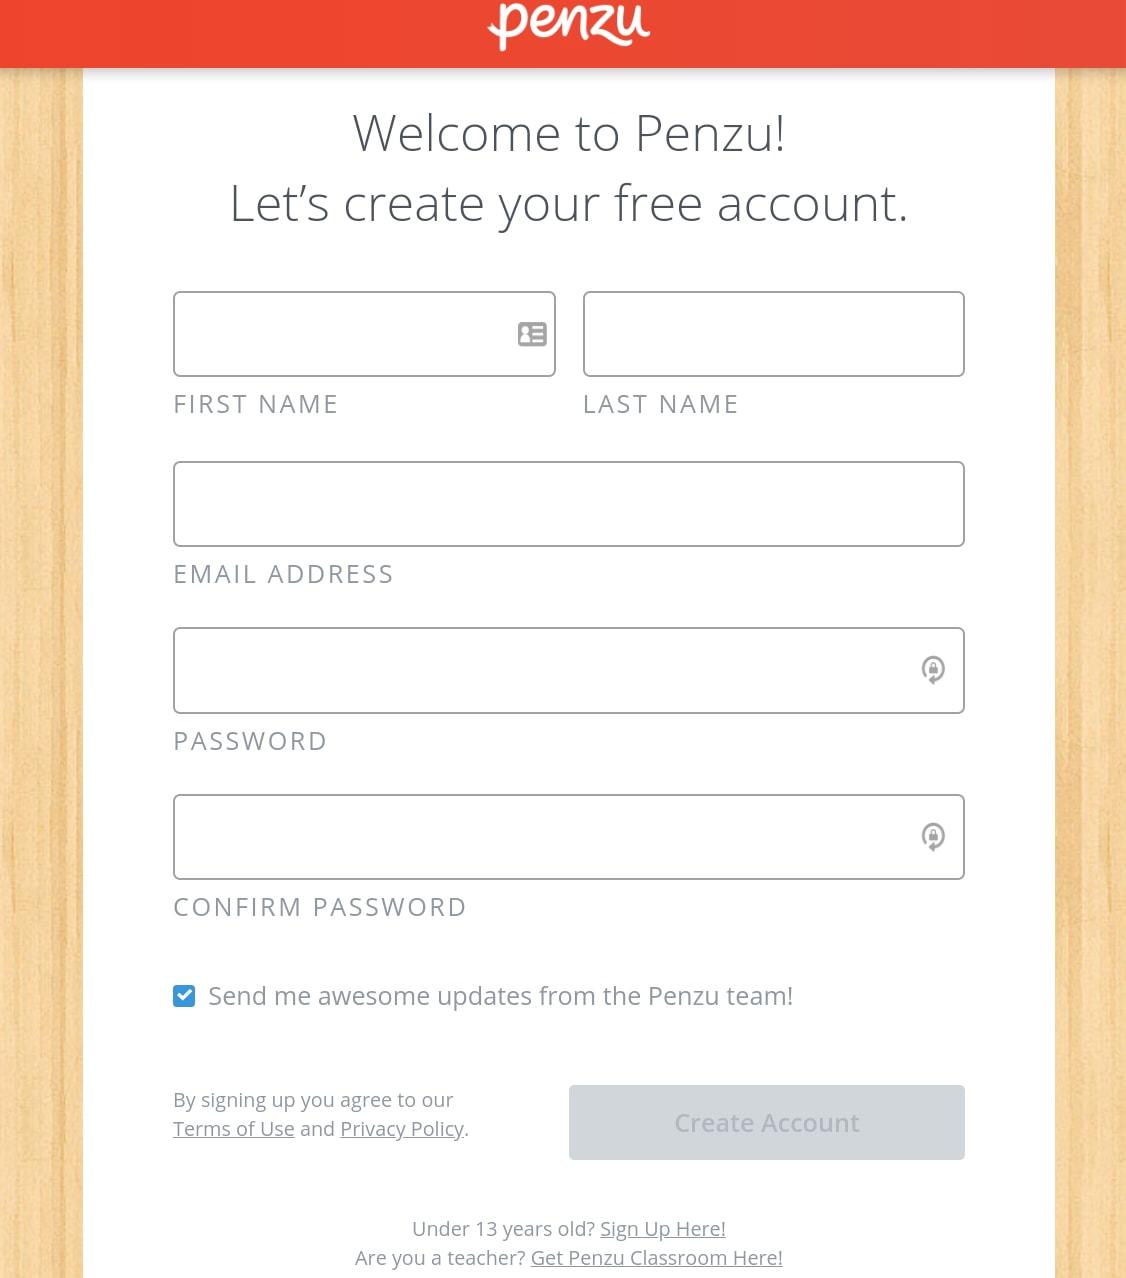 Penzu - Getting Started